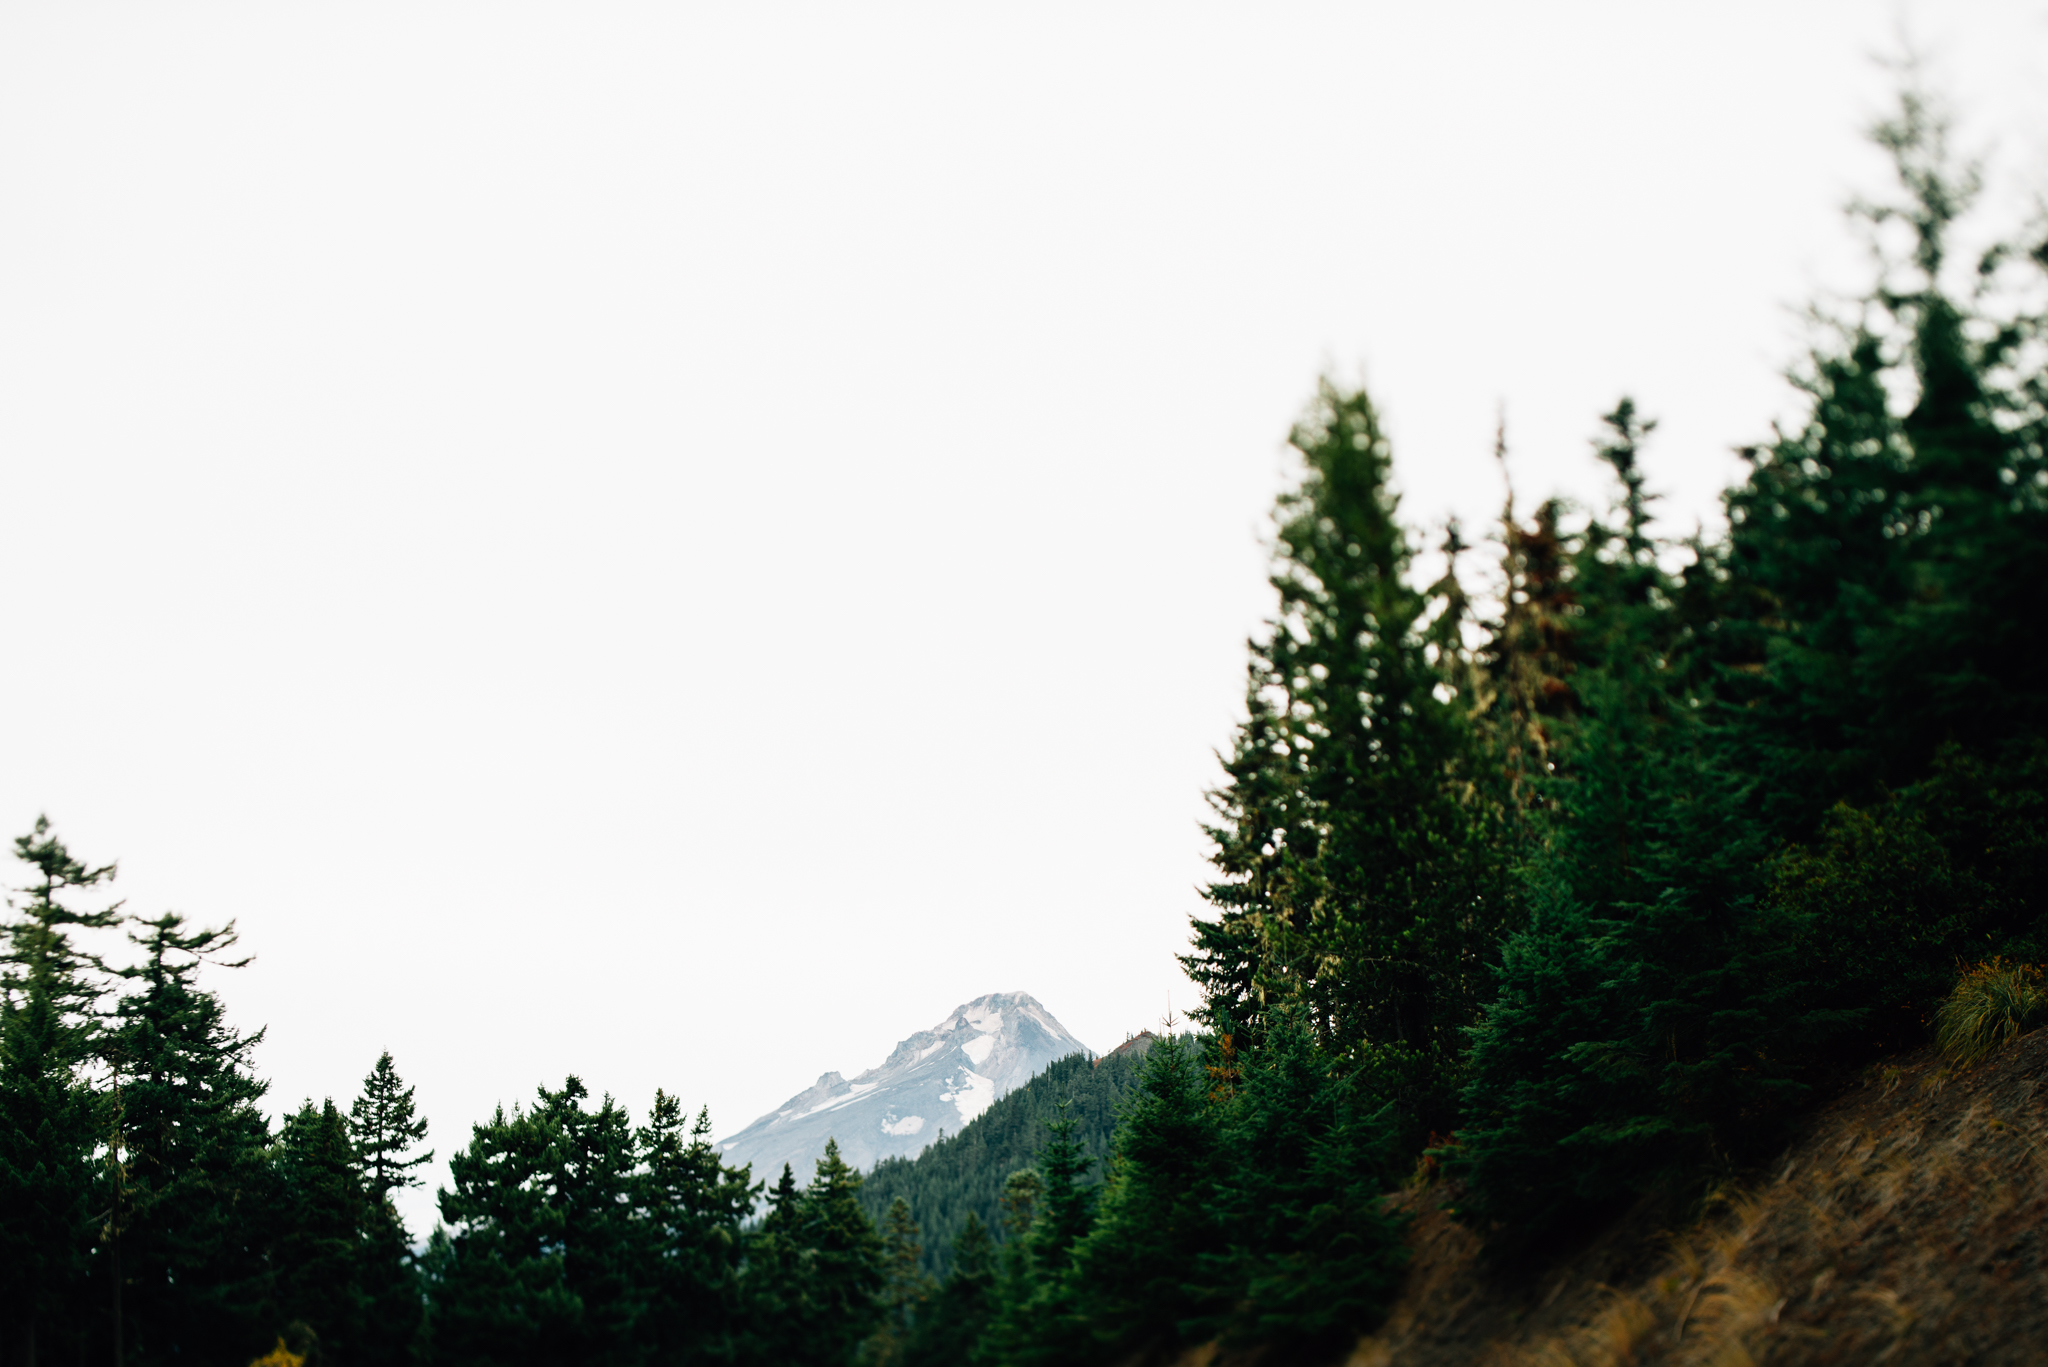 The Ryans Photography - Mt. Hood Oregon Adventure-001.jpg